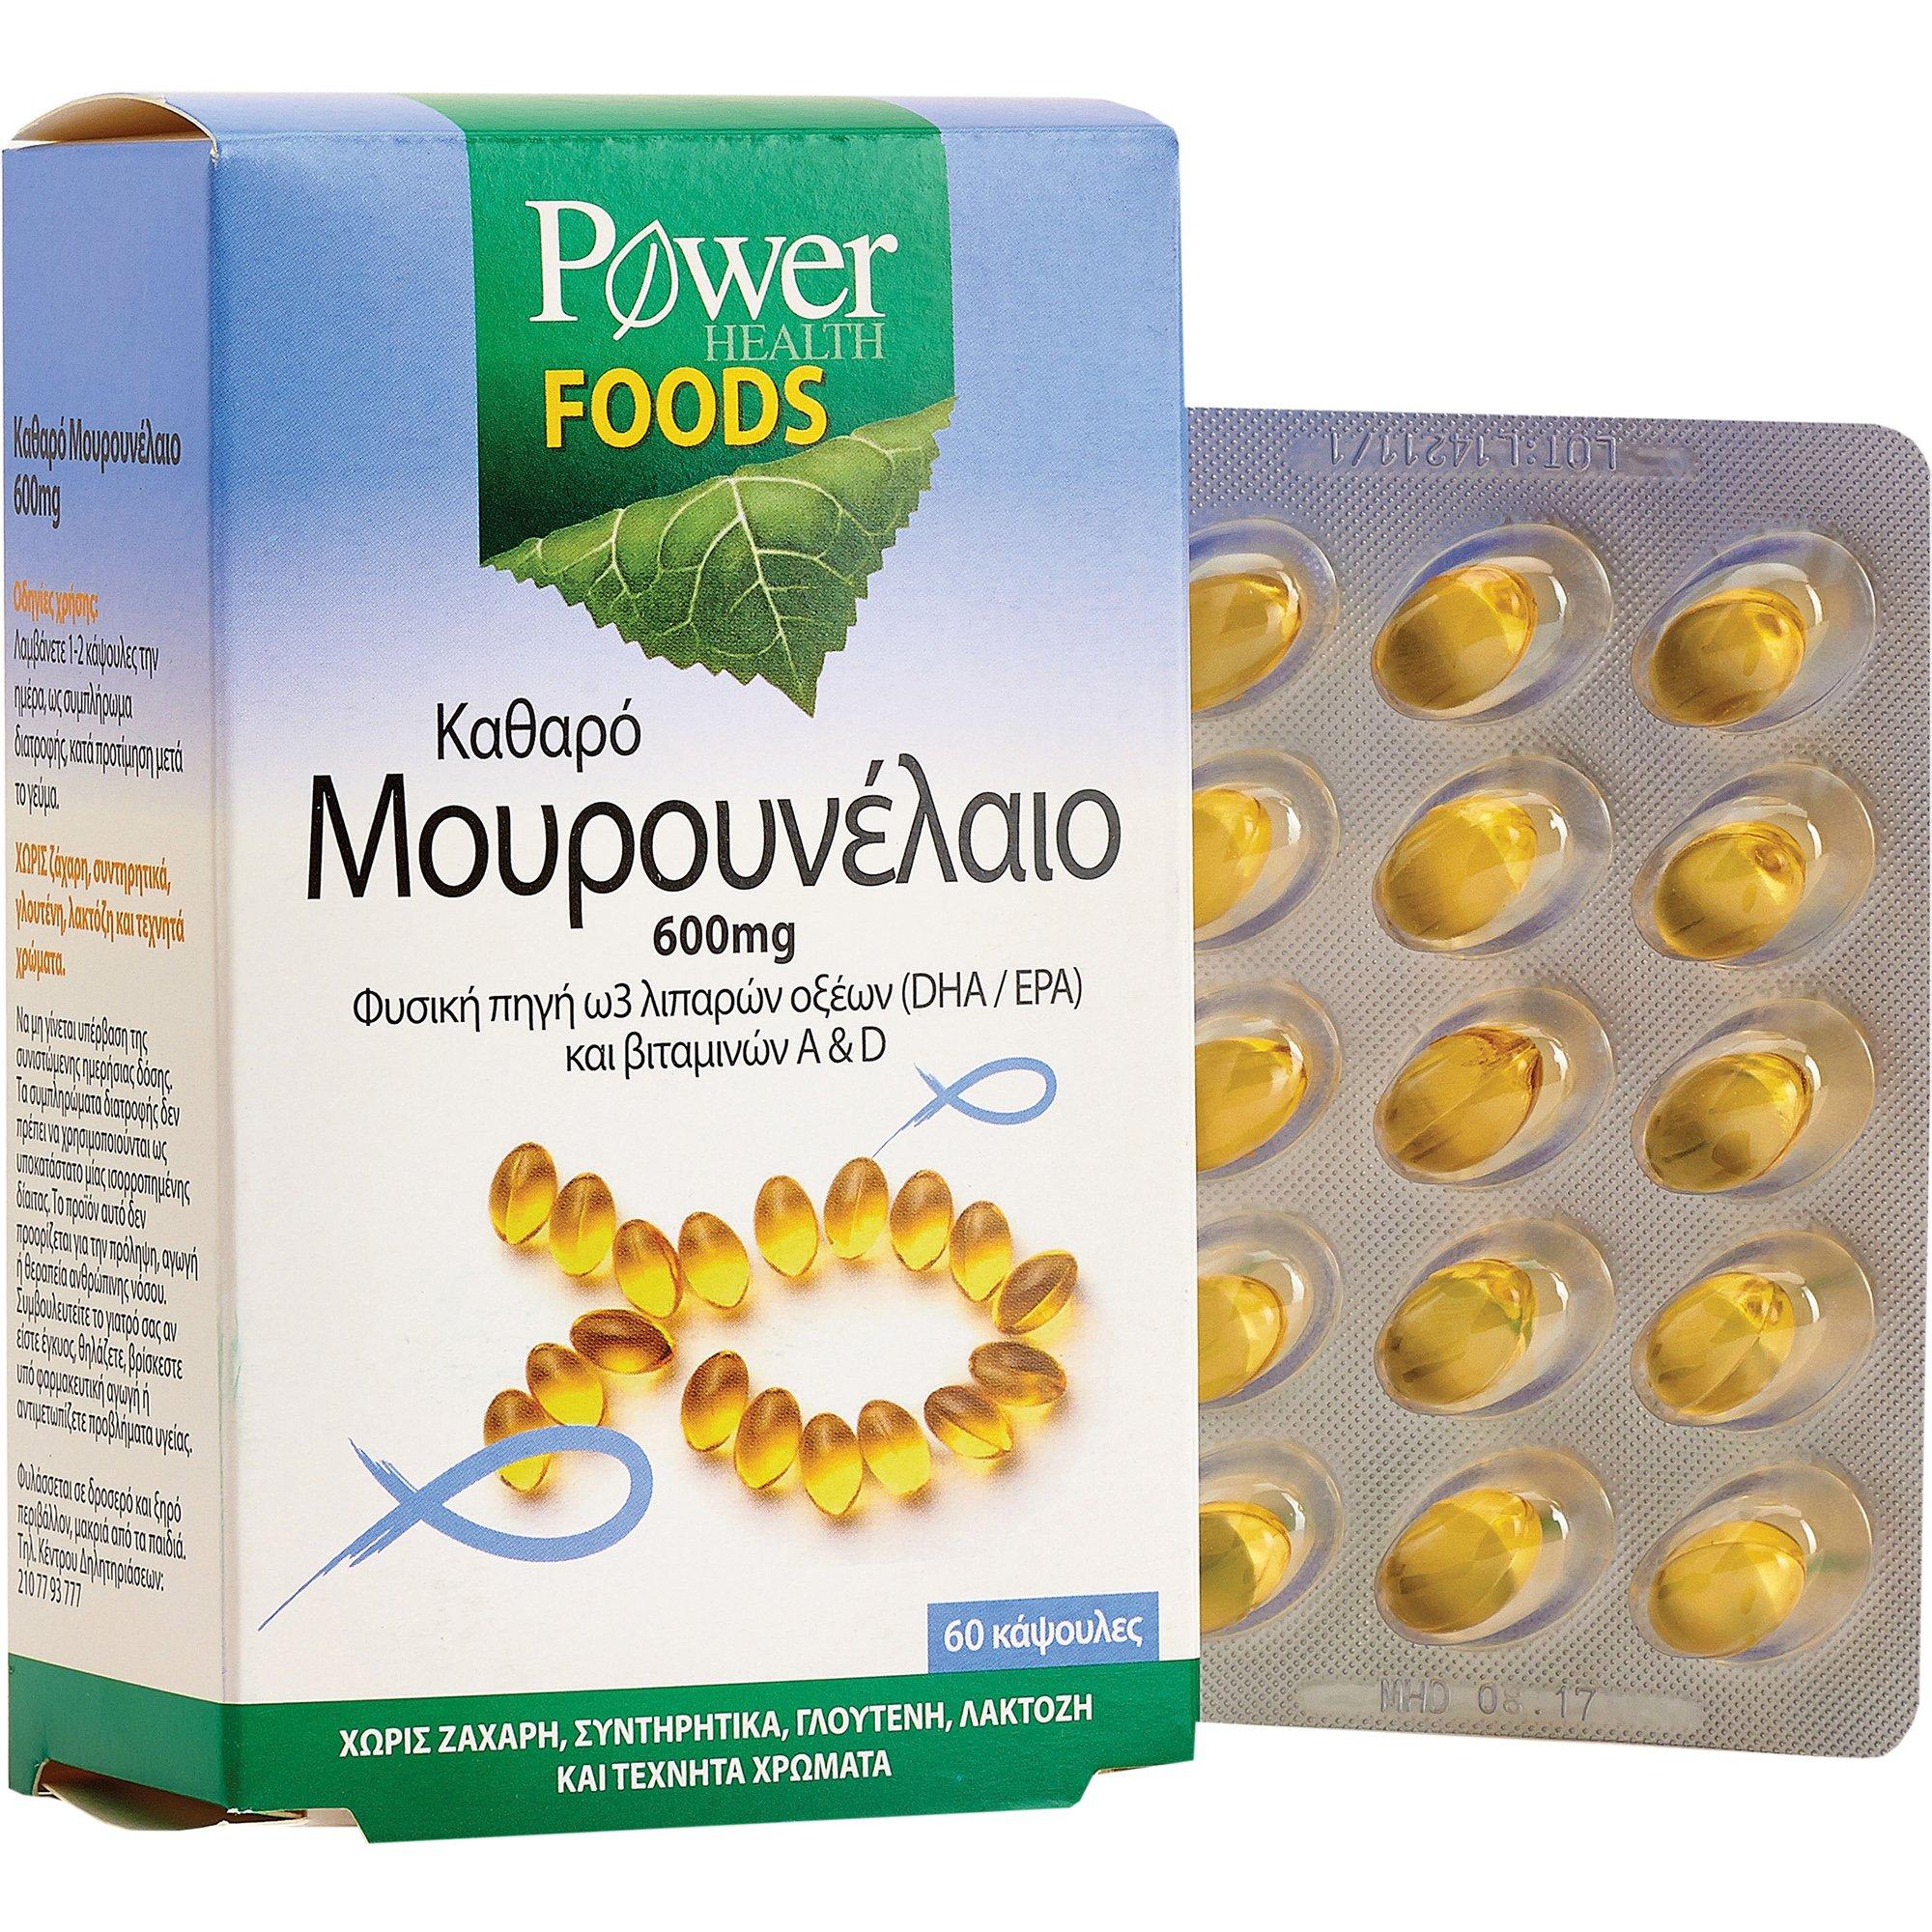 Power Health Foods Συμπλήρωμα διατροφής με Καθαρό Μουρουνέλαιο, ΒιταμίνεςΑ & D60caps